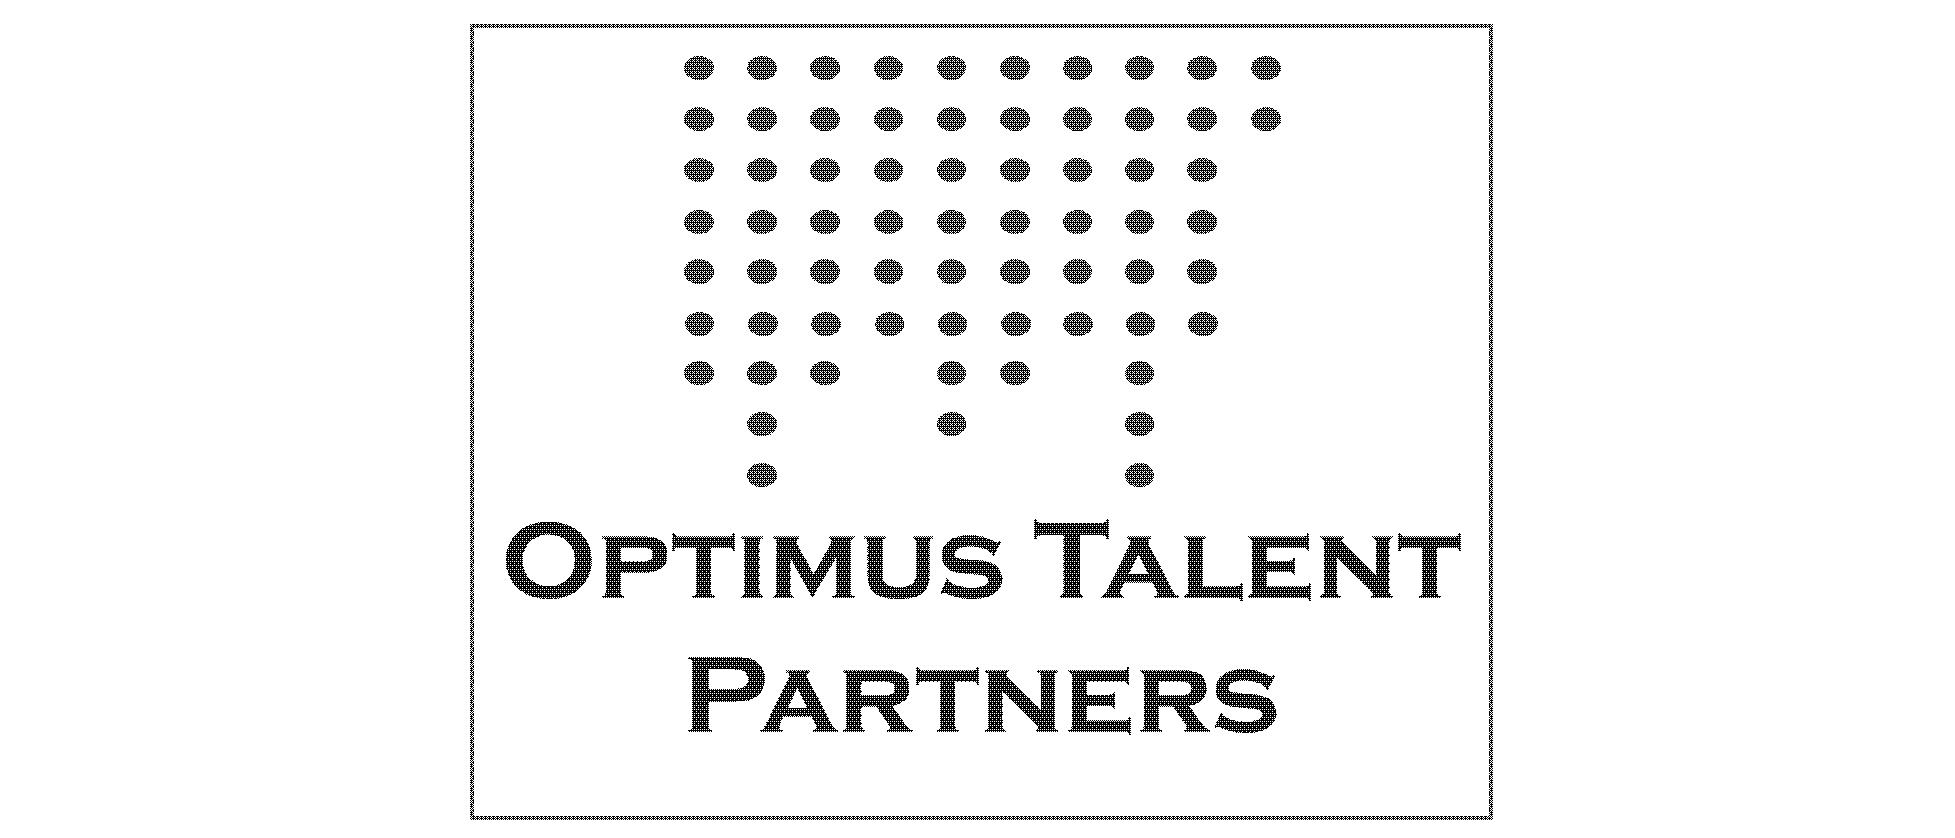 Optimus_Talent_Partners.png